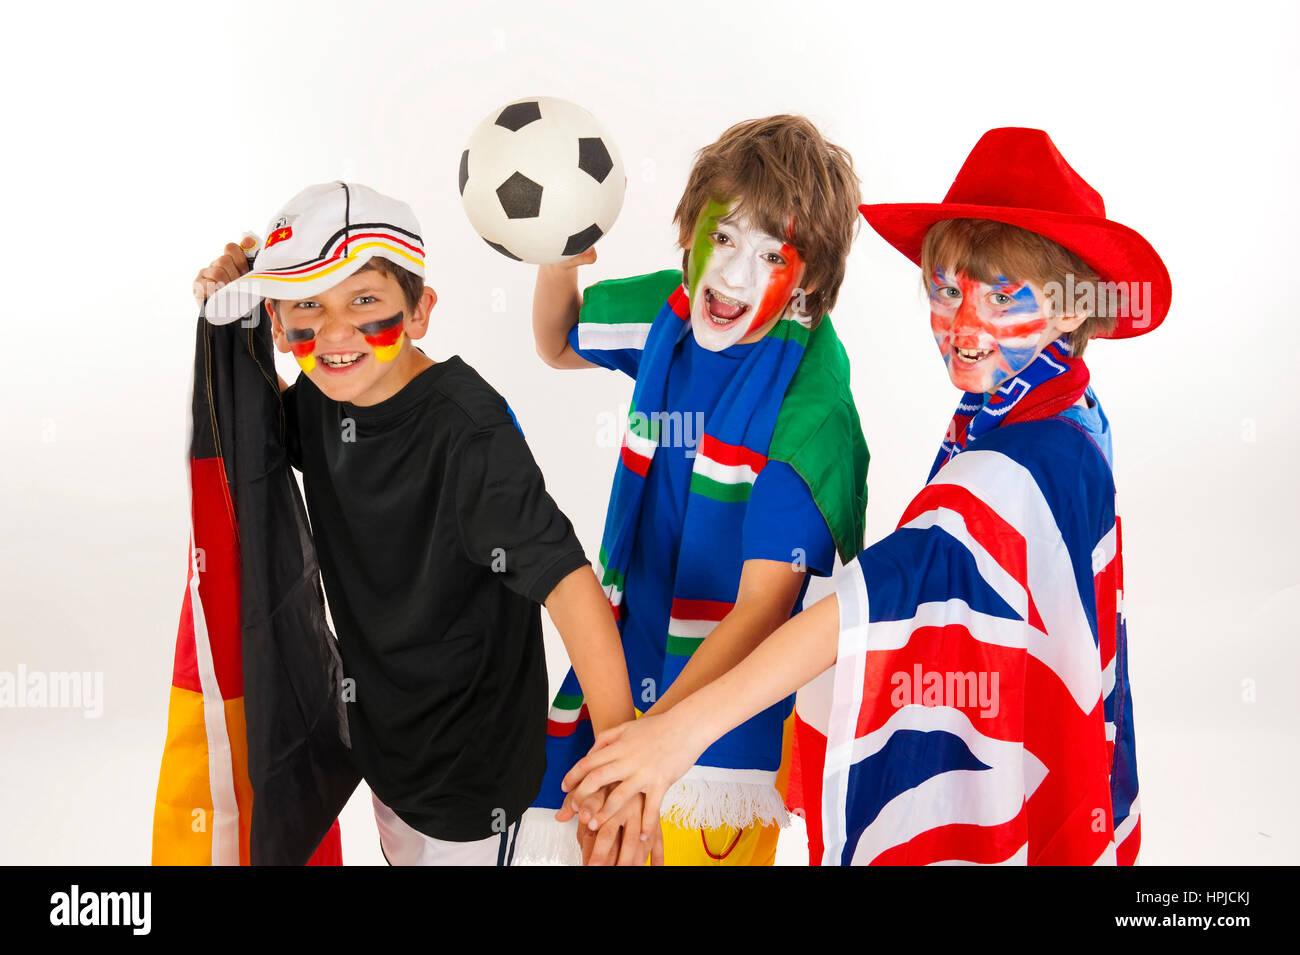 Model released , Fussballfans, Fussball-WM - soccer fans - Stock Image